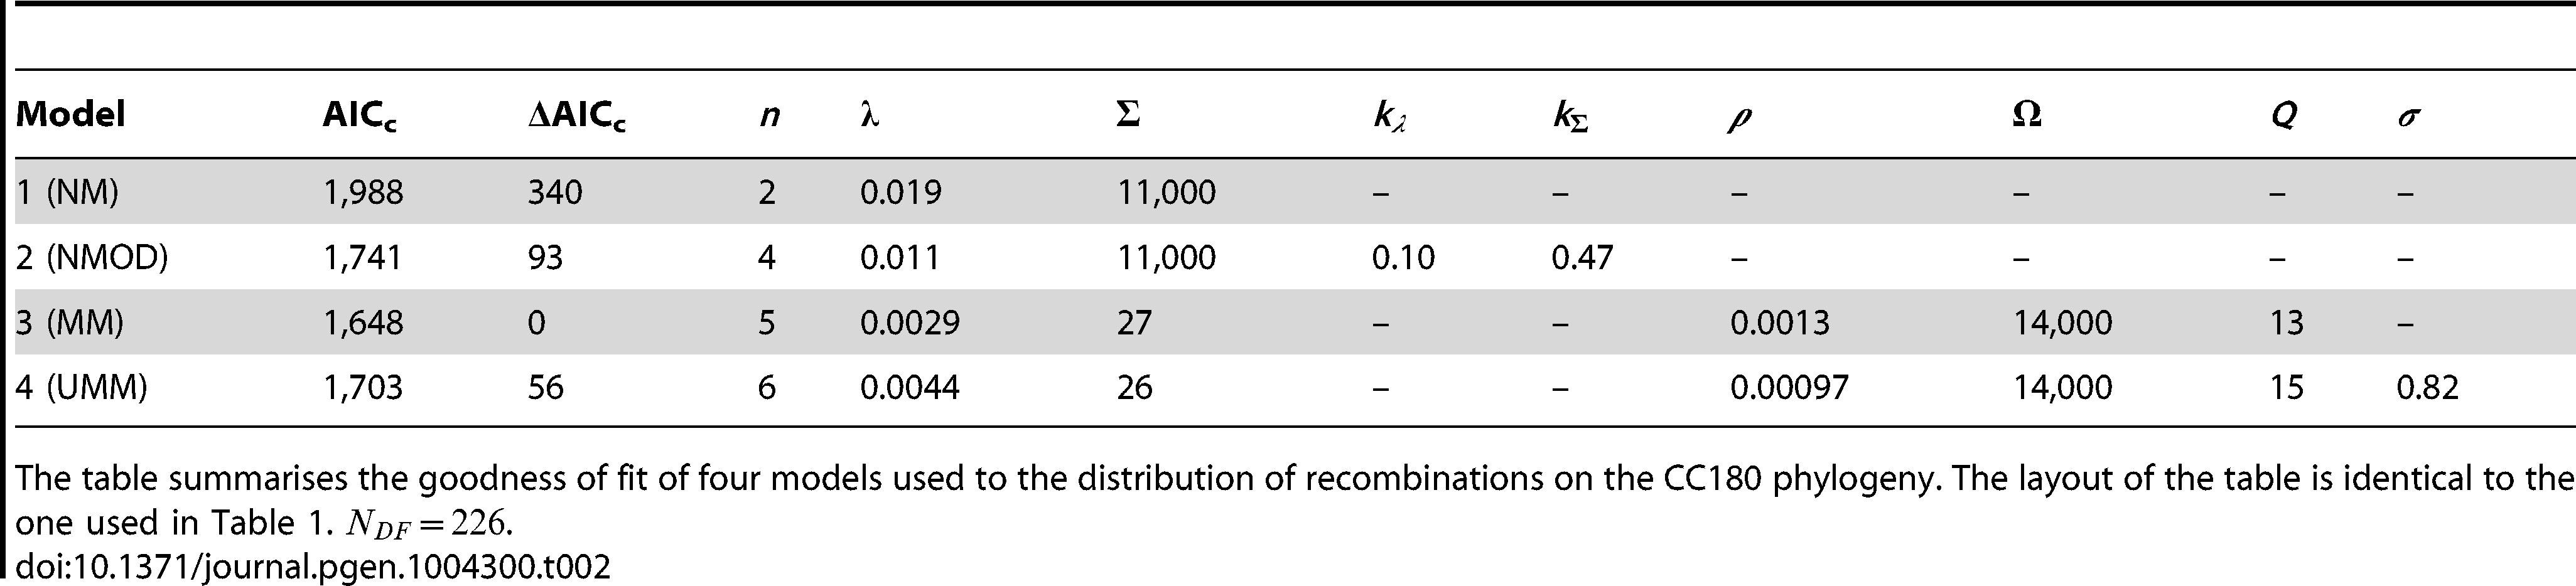 Model comparison for CC180 data fit.